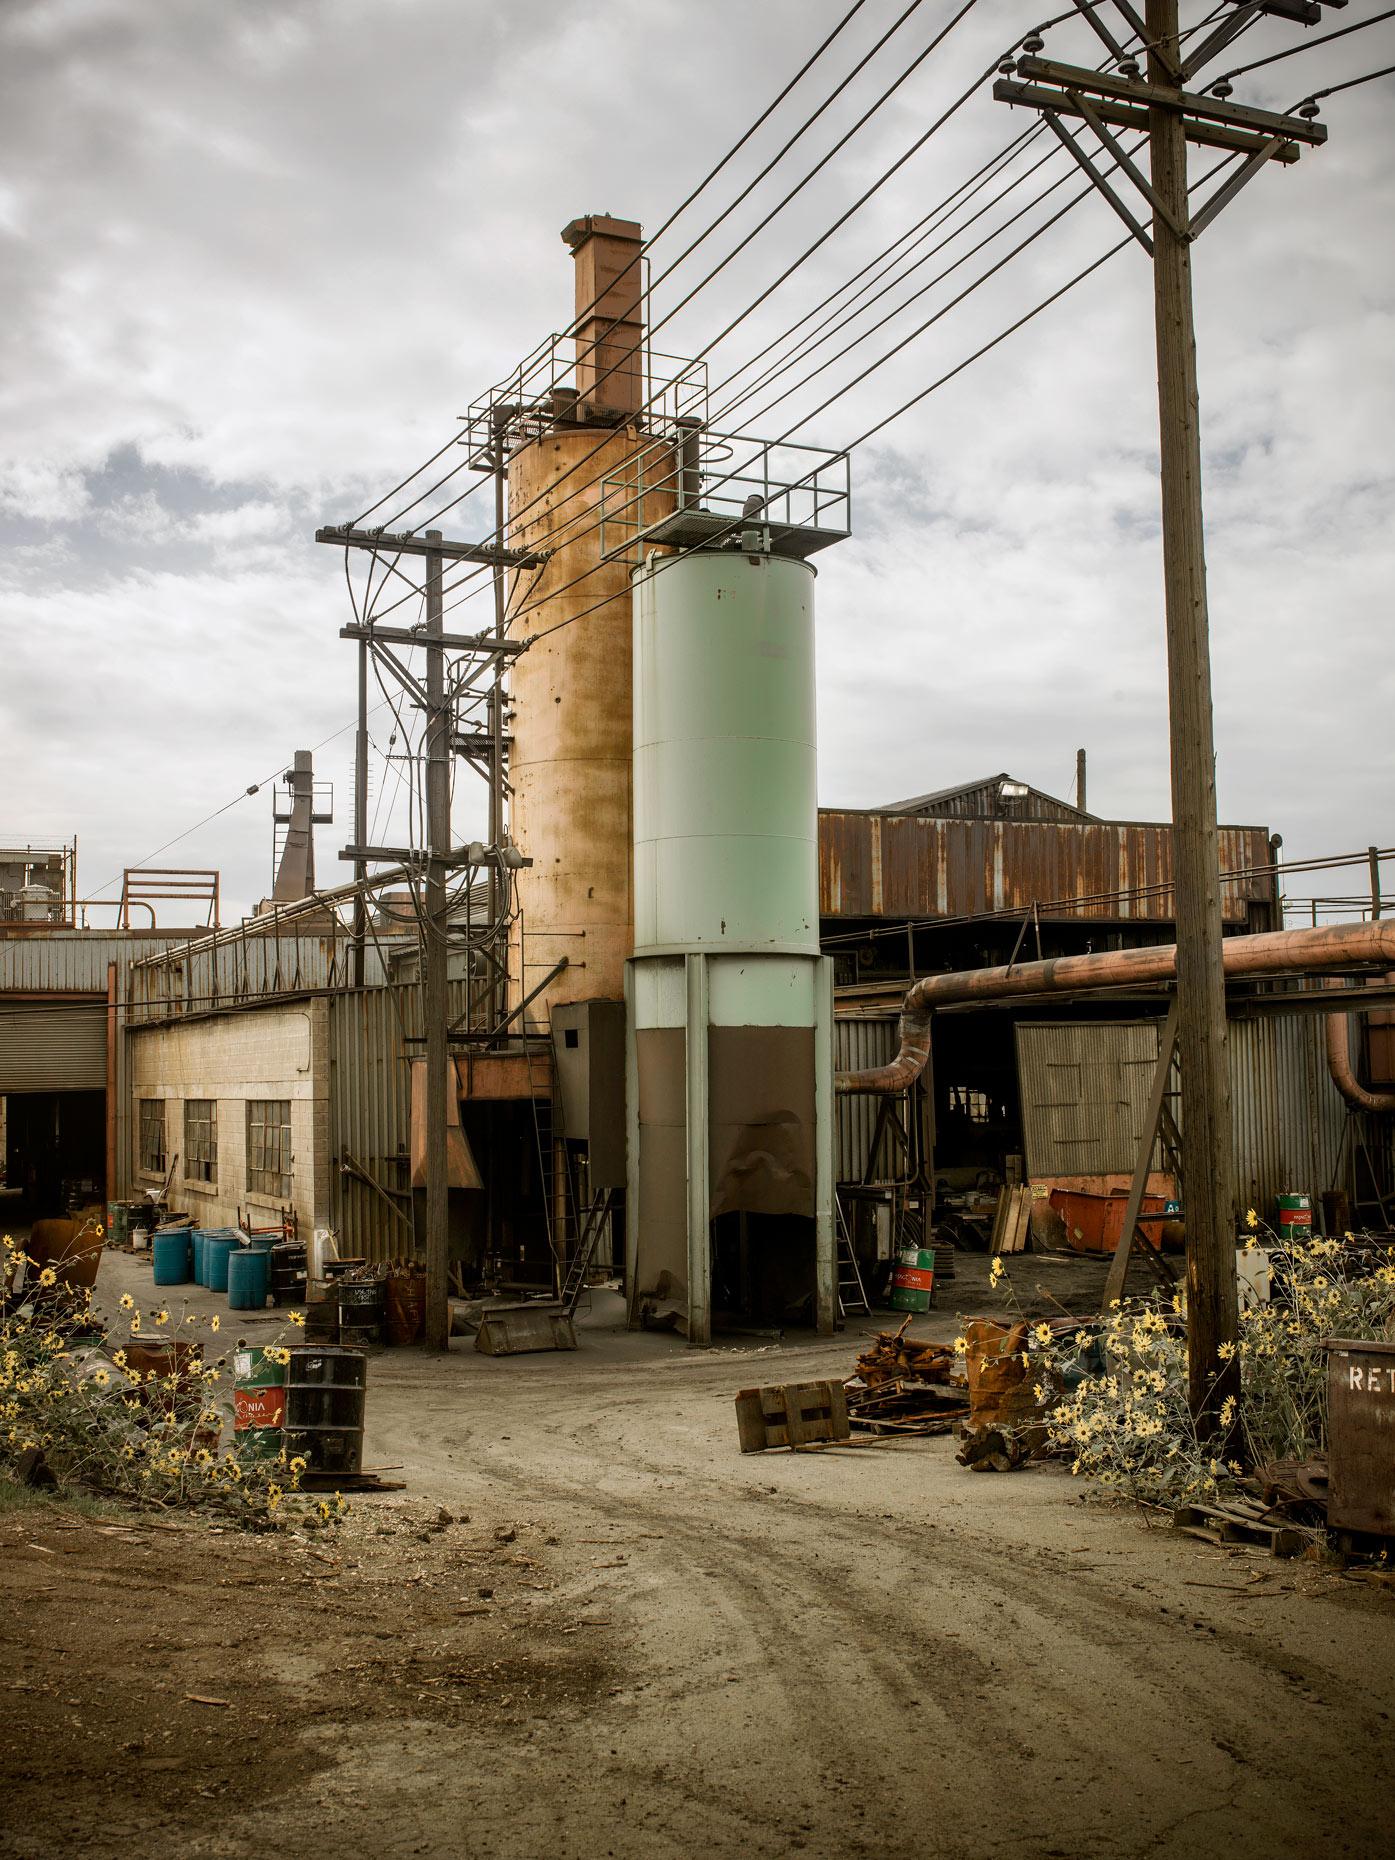 Projects-Editorial-Photography-Derek-Israelsen-018-Sunflower-Foundry.jpg